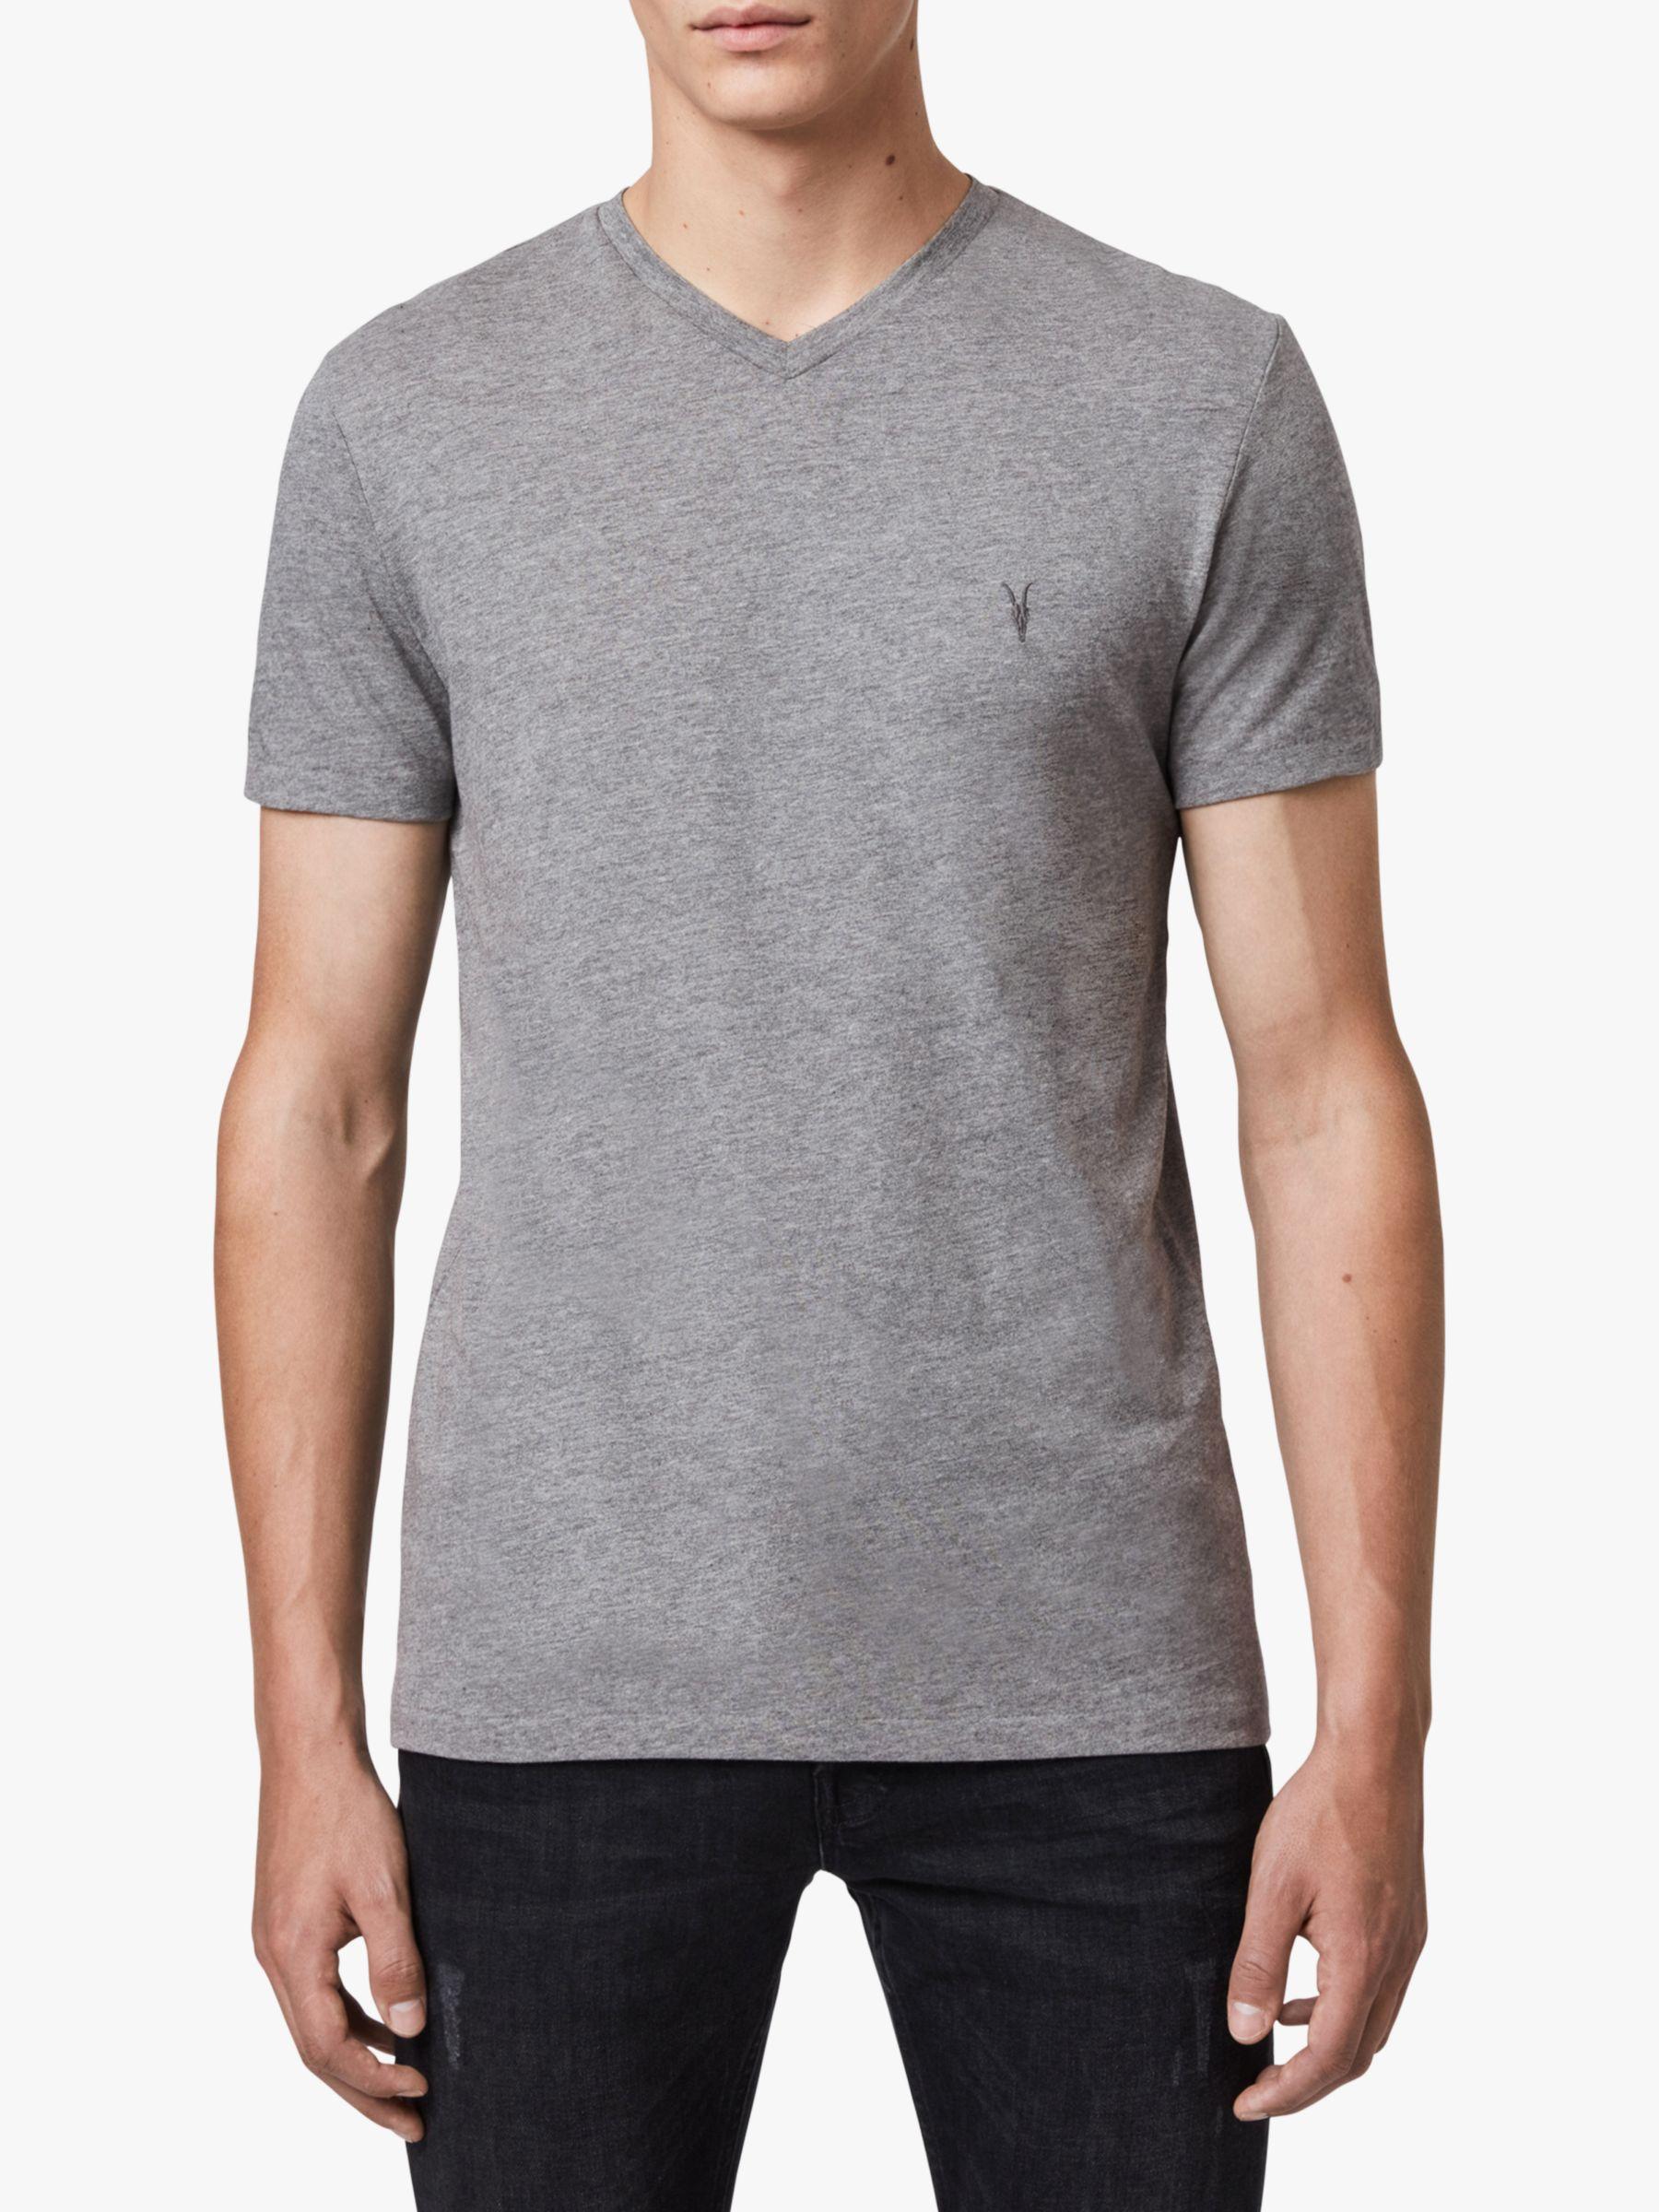 AllSaints AllSaints Tonic V-Neck T-Shirt